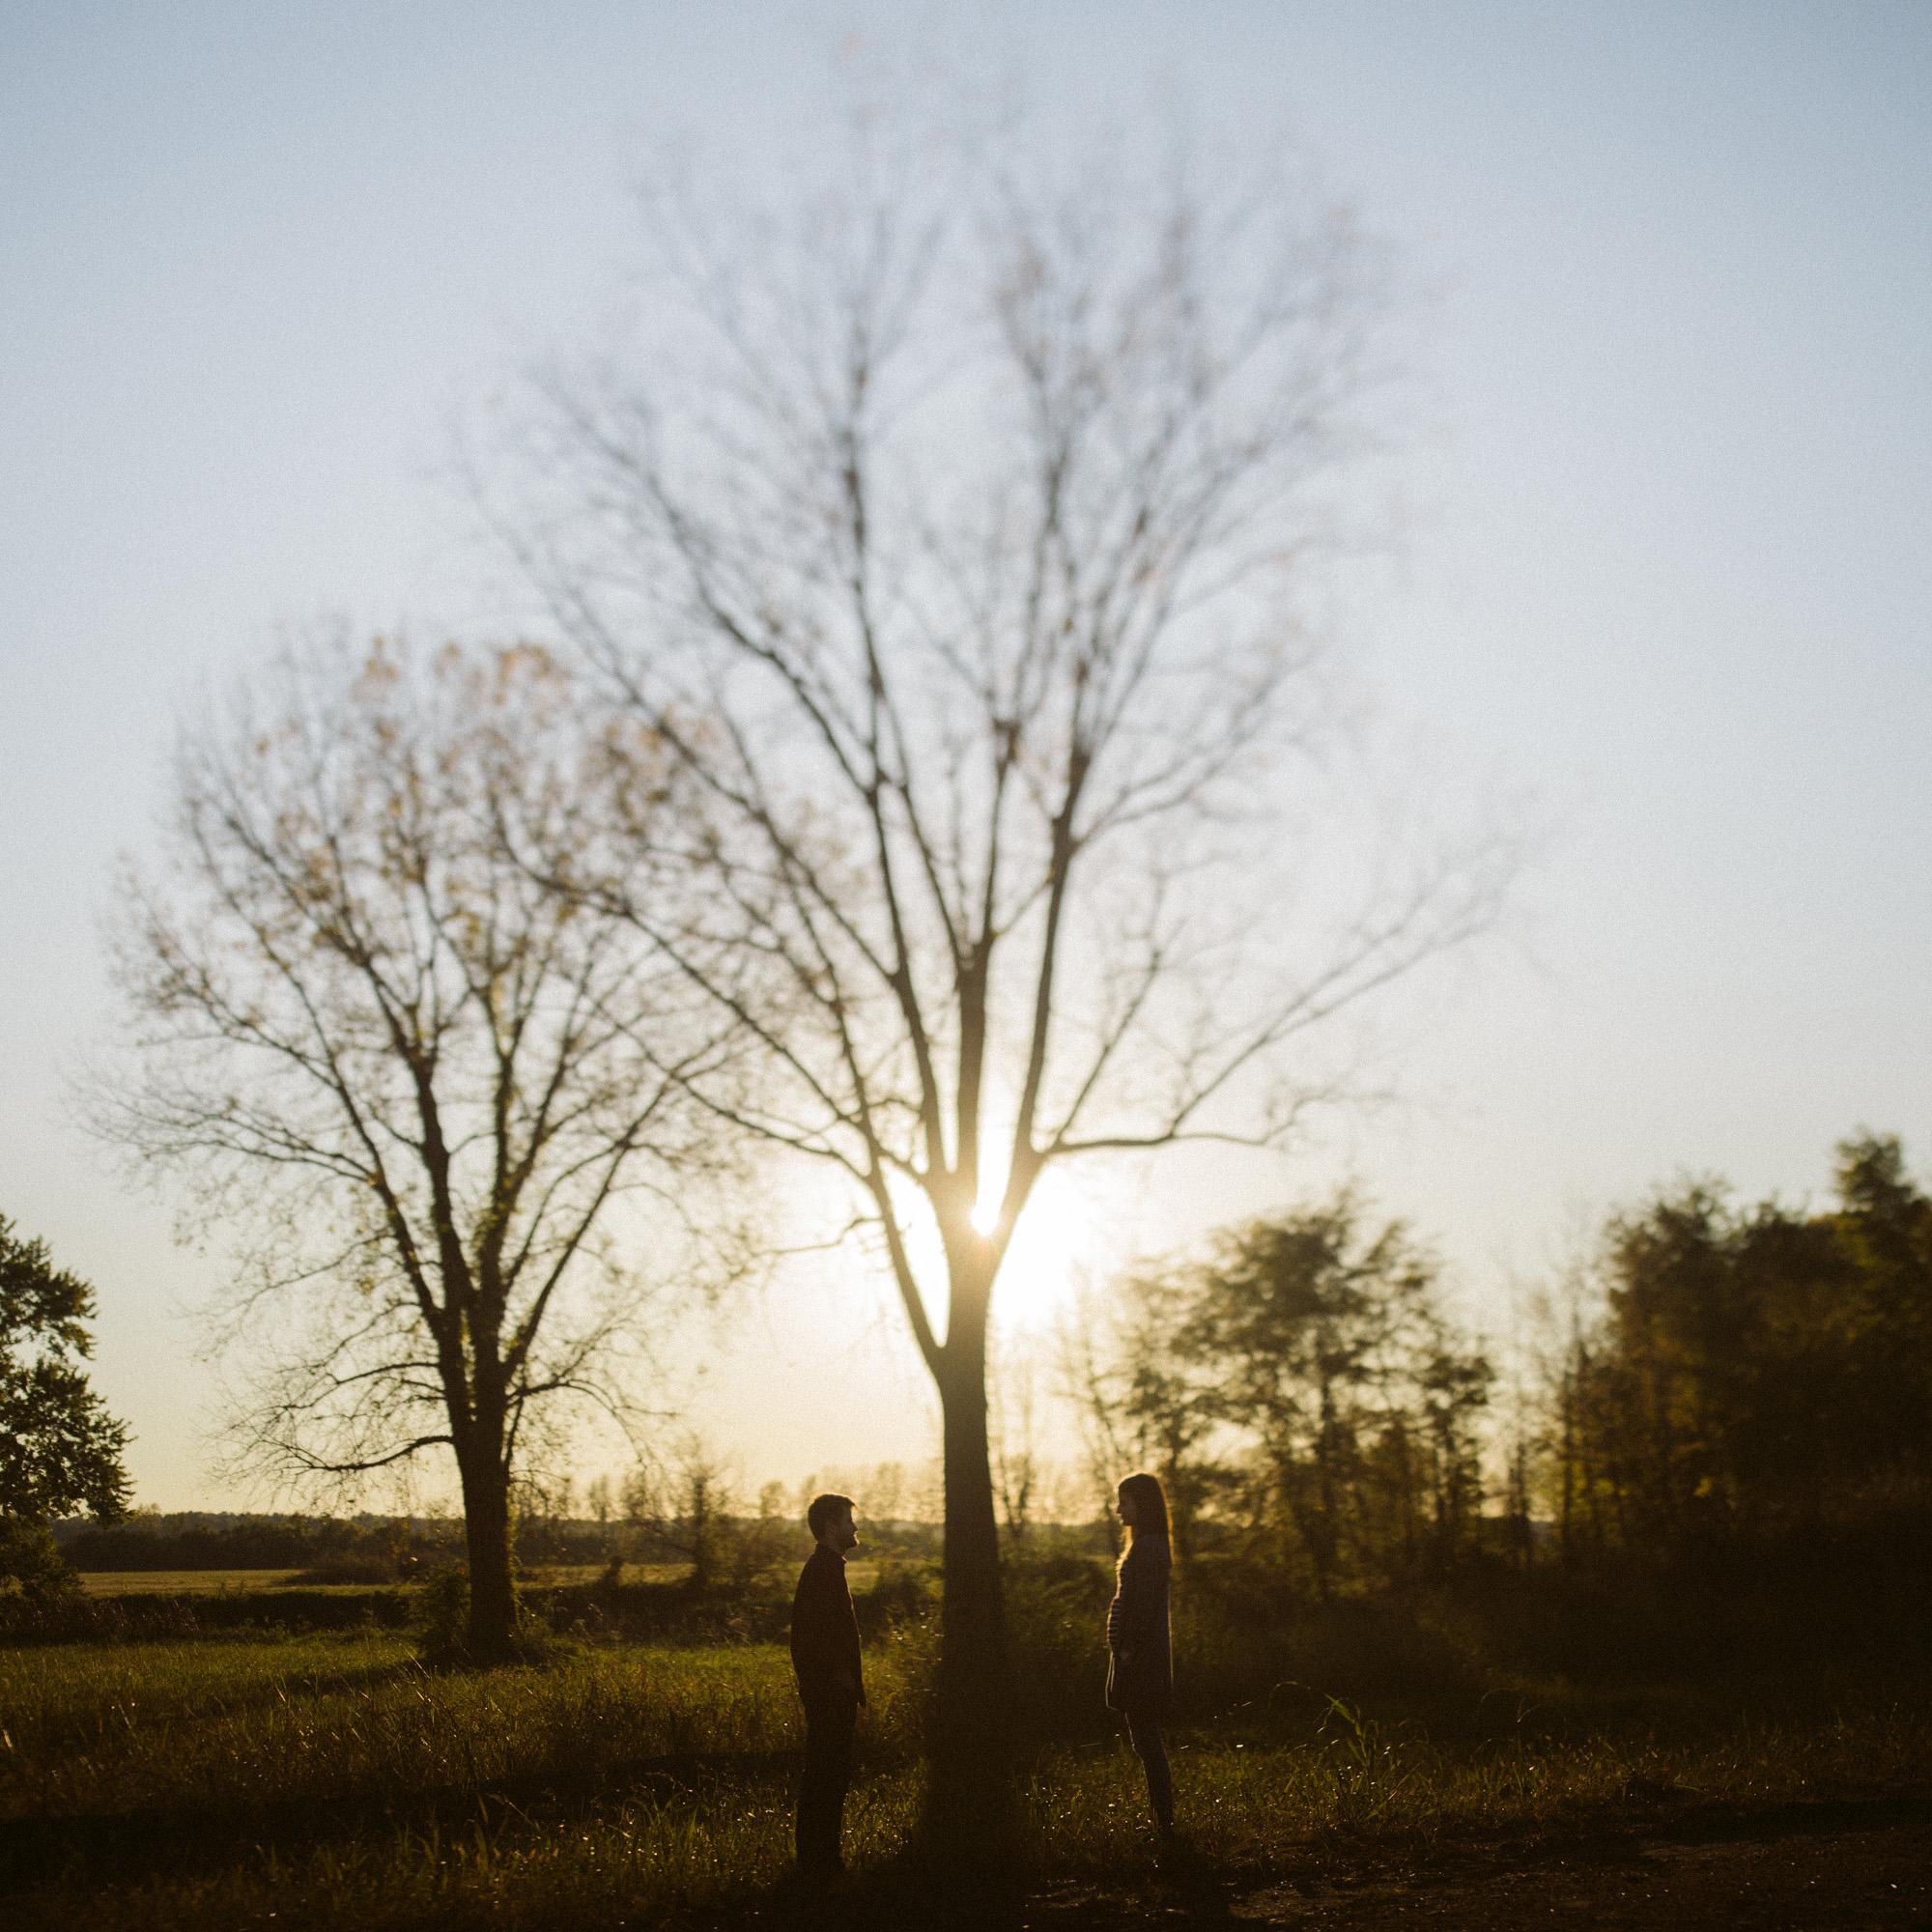 alec_vanderboom_Kansas_City_Engagement_Photos-0021.jpg